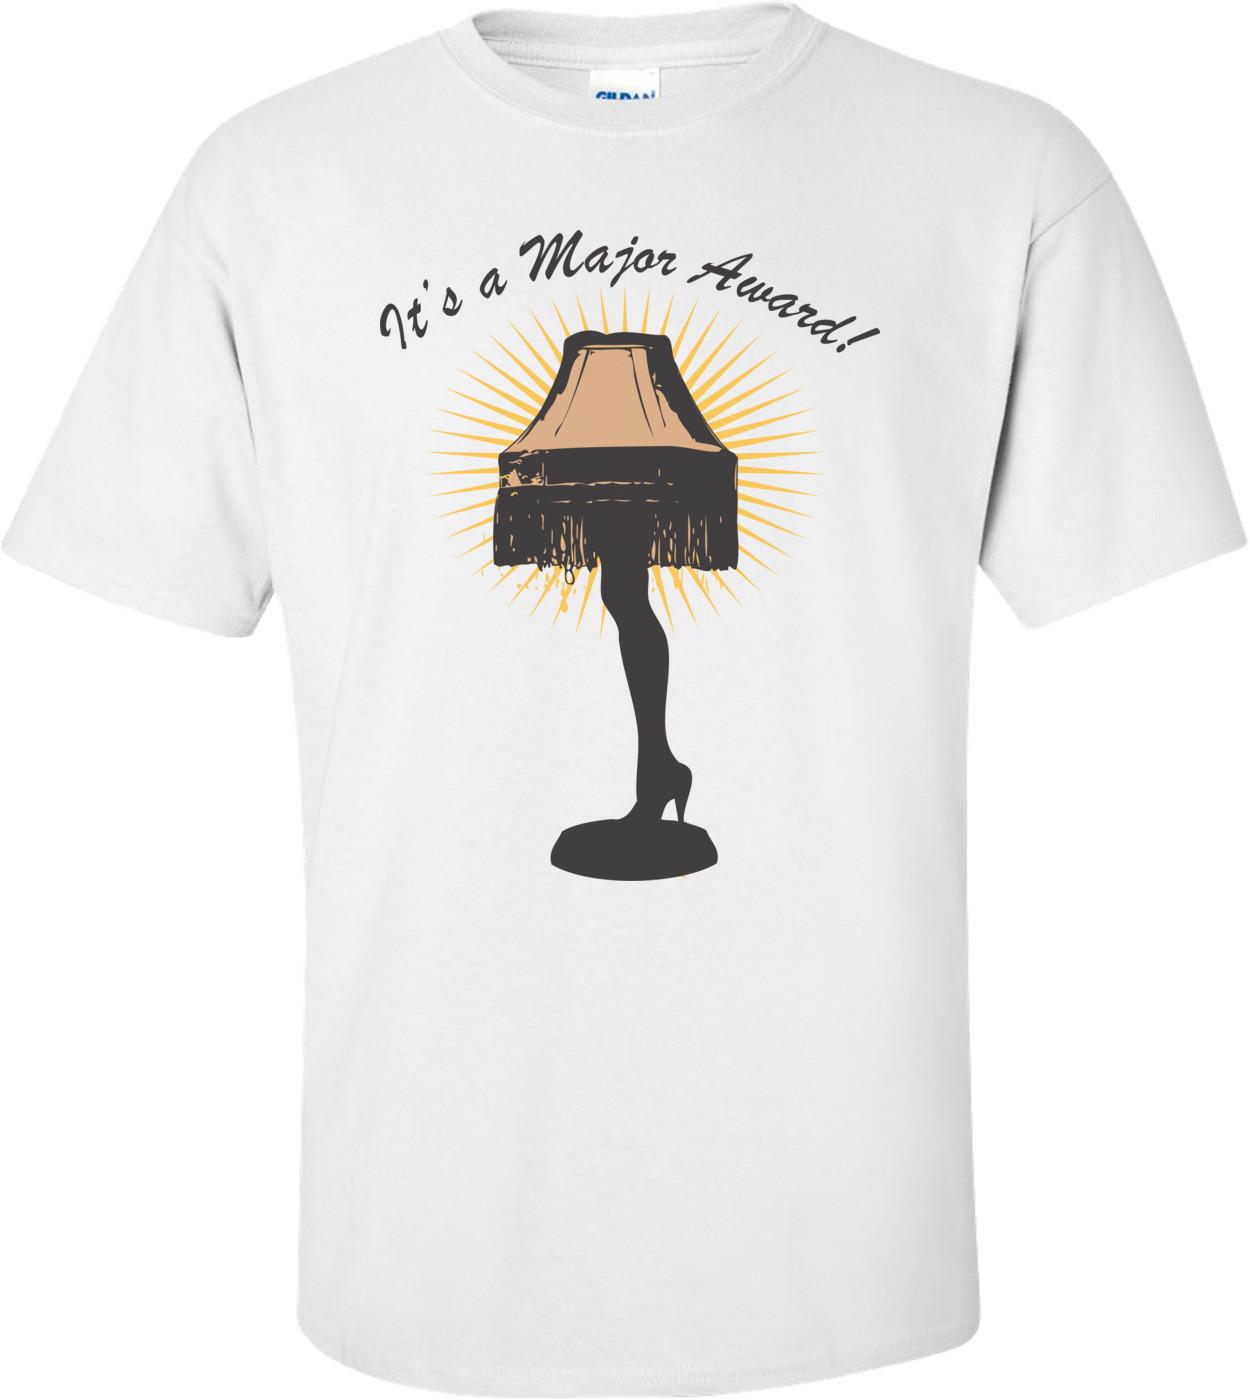 It's A Major Award - Christmas Story T-shirt